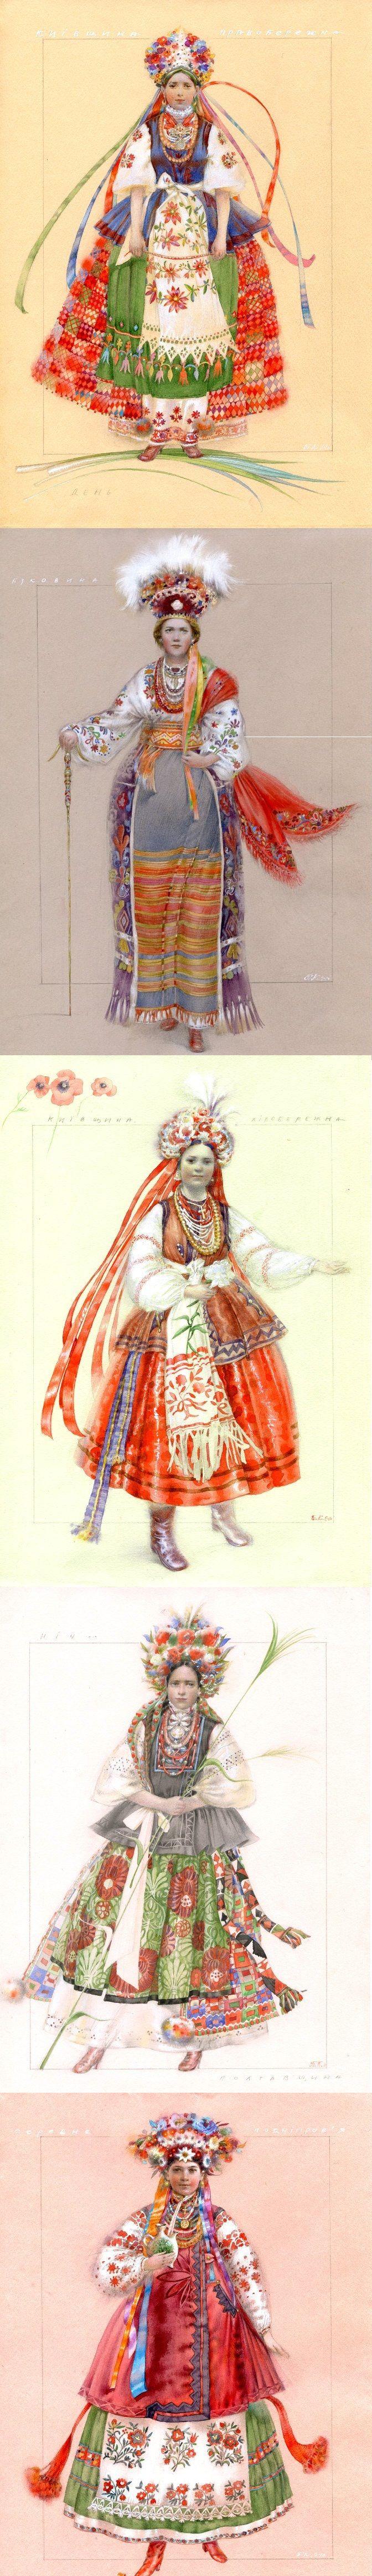 Variations of Ukrainian bridal costumes. #cobblestonefreeway #culturetours #culture #adventuretours #ukrainianculture #traveltoukraine #travelinspiration #ukiefashion www.cobblestonefreeway.ca